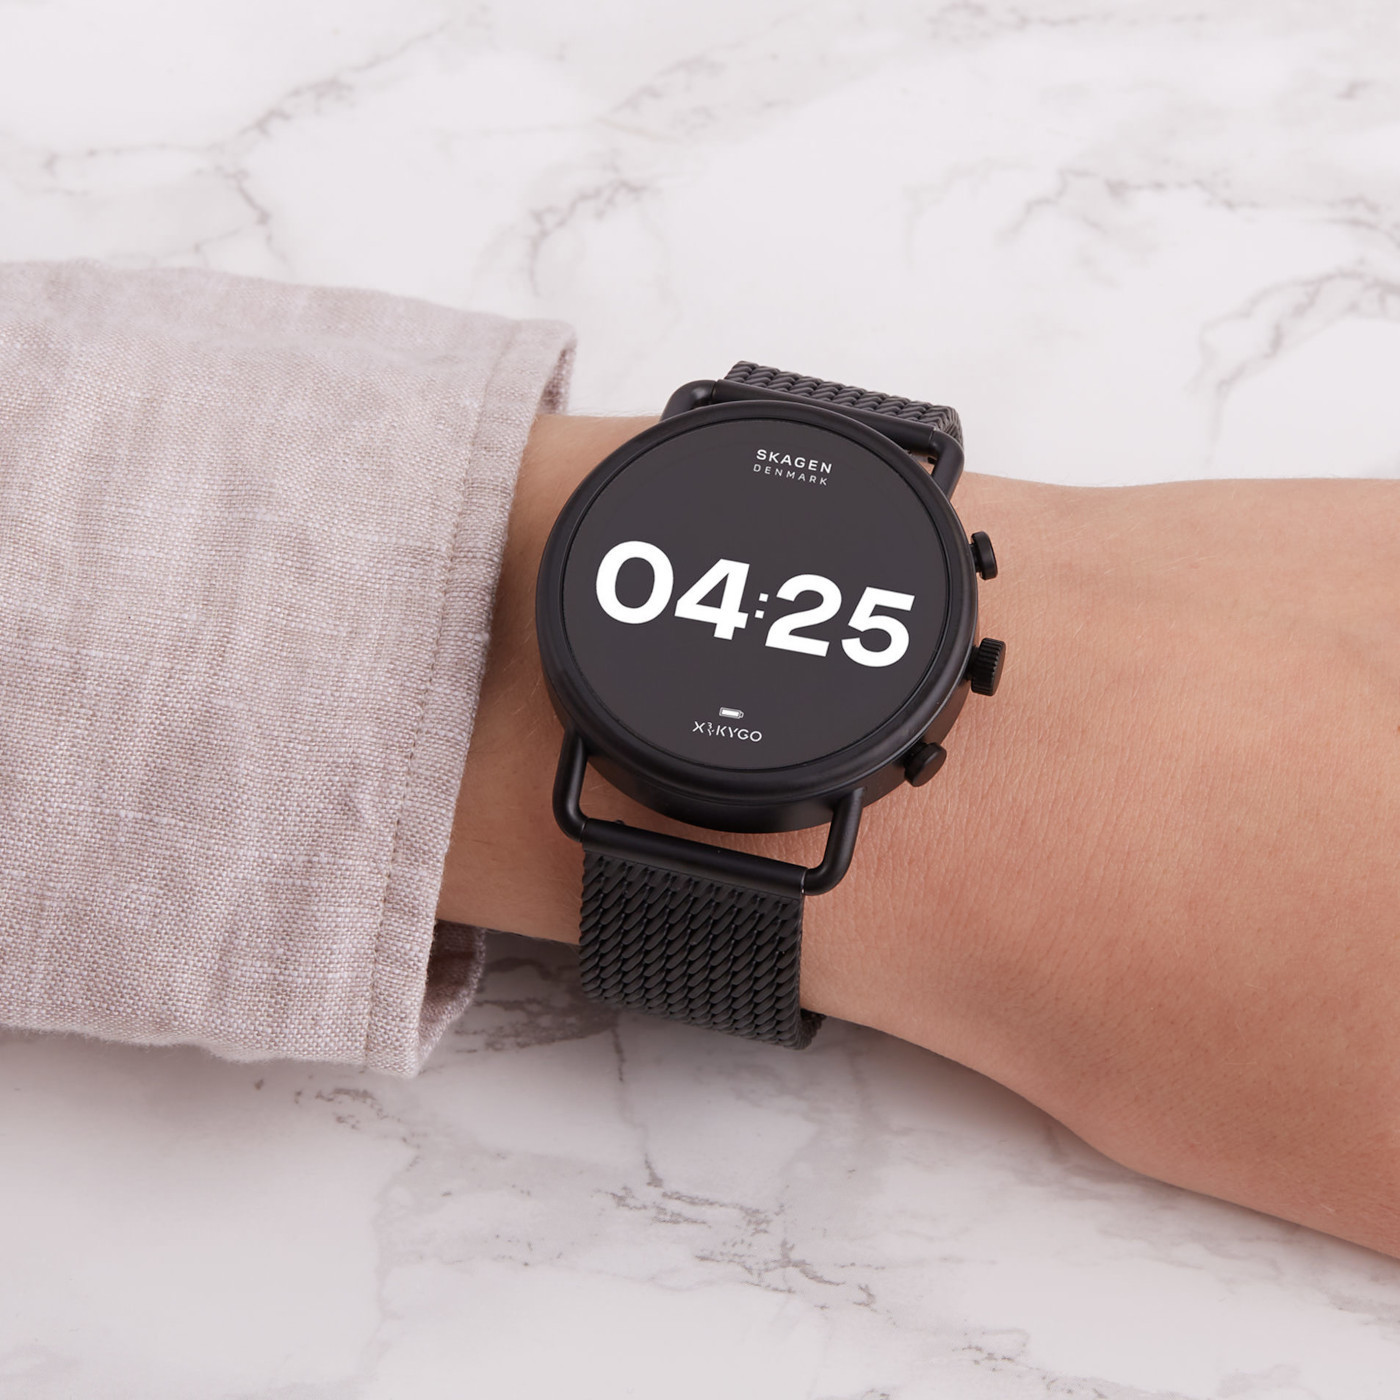 Skagen Falster 3 Gen 5 Display Smartwatch SKT5207